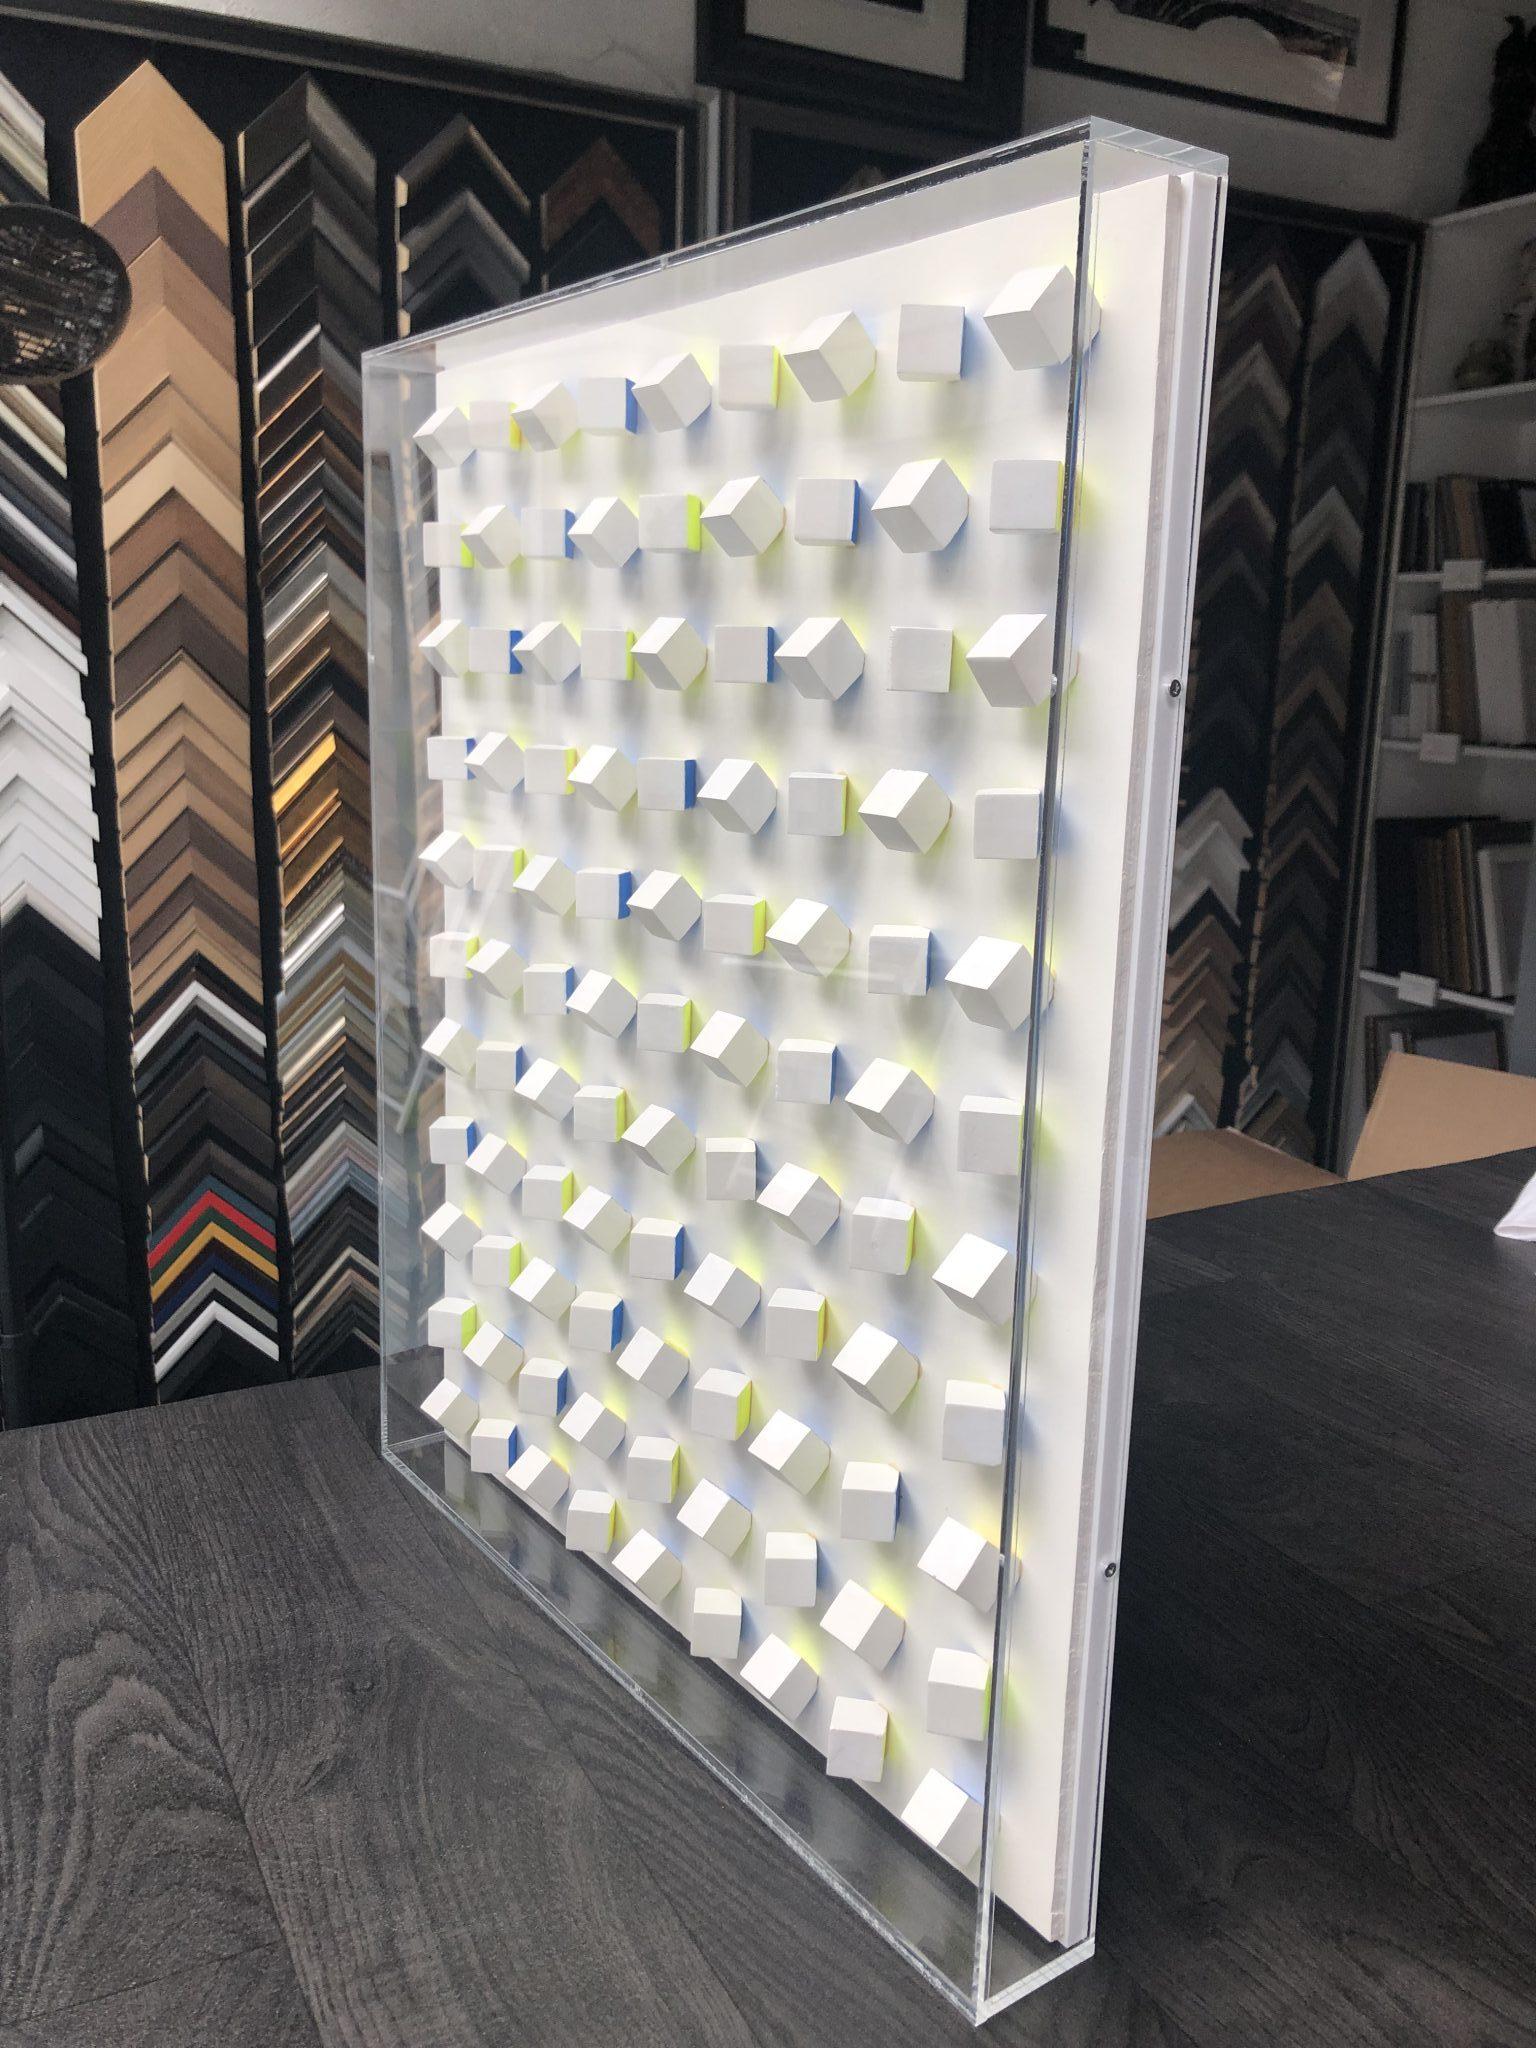 Acrylic Wall Display Case for Three 1:2